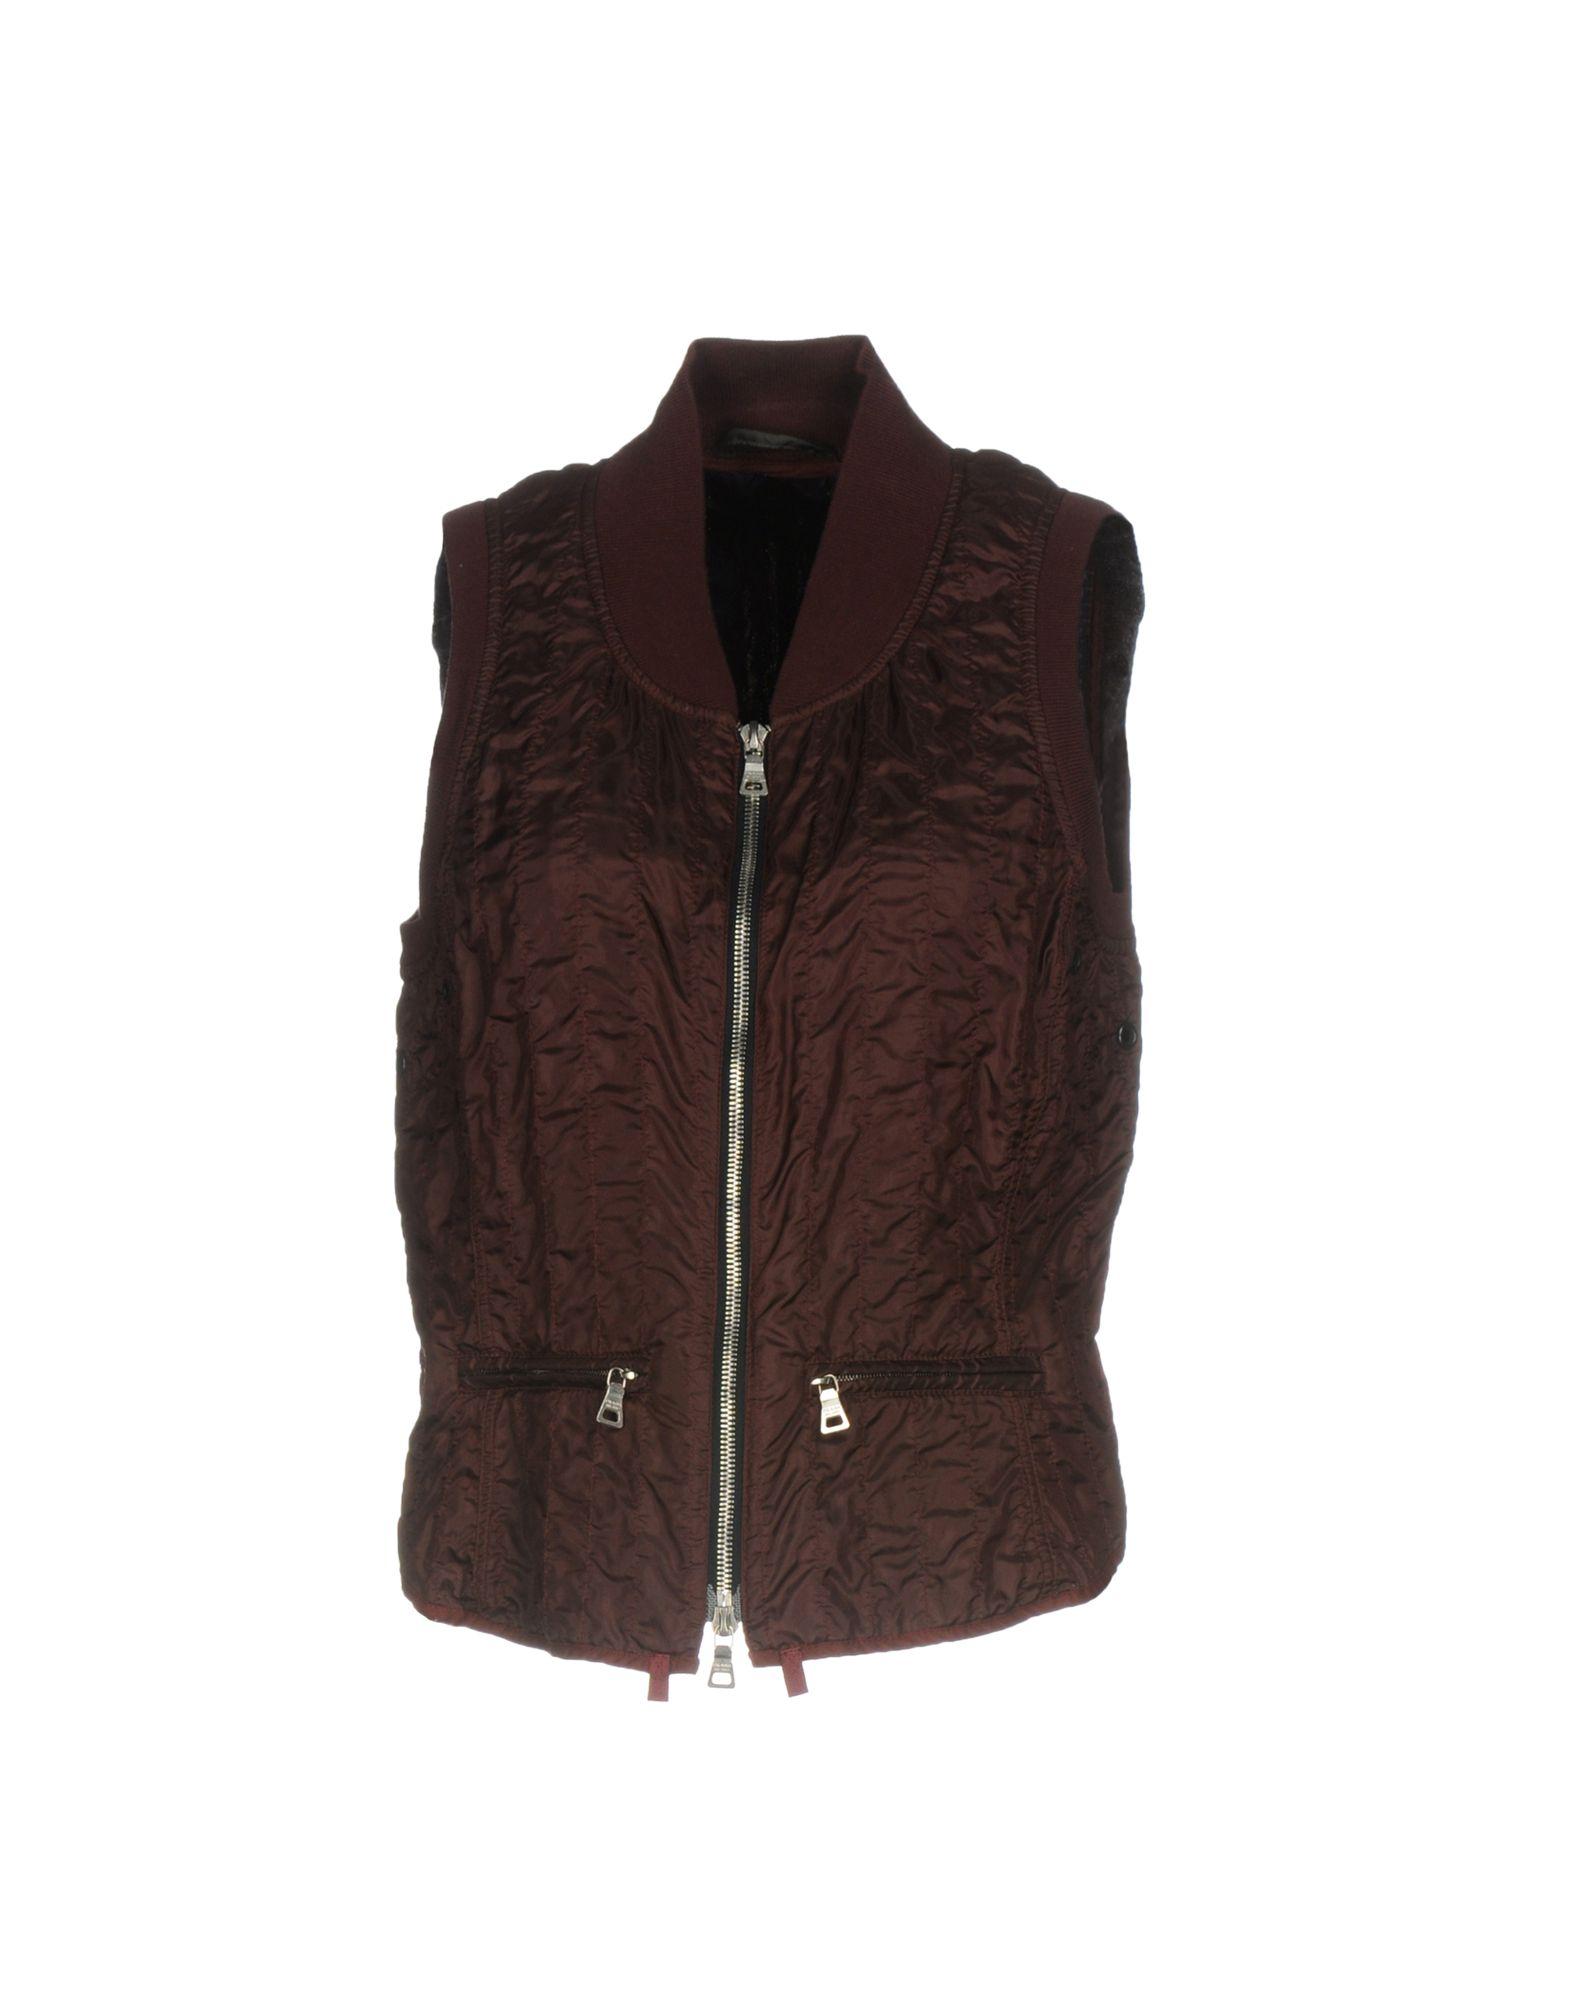 PRADA SPORT Damen Jacke Farbe Bordeaux Größe 4